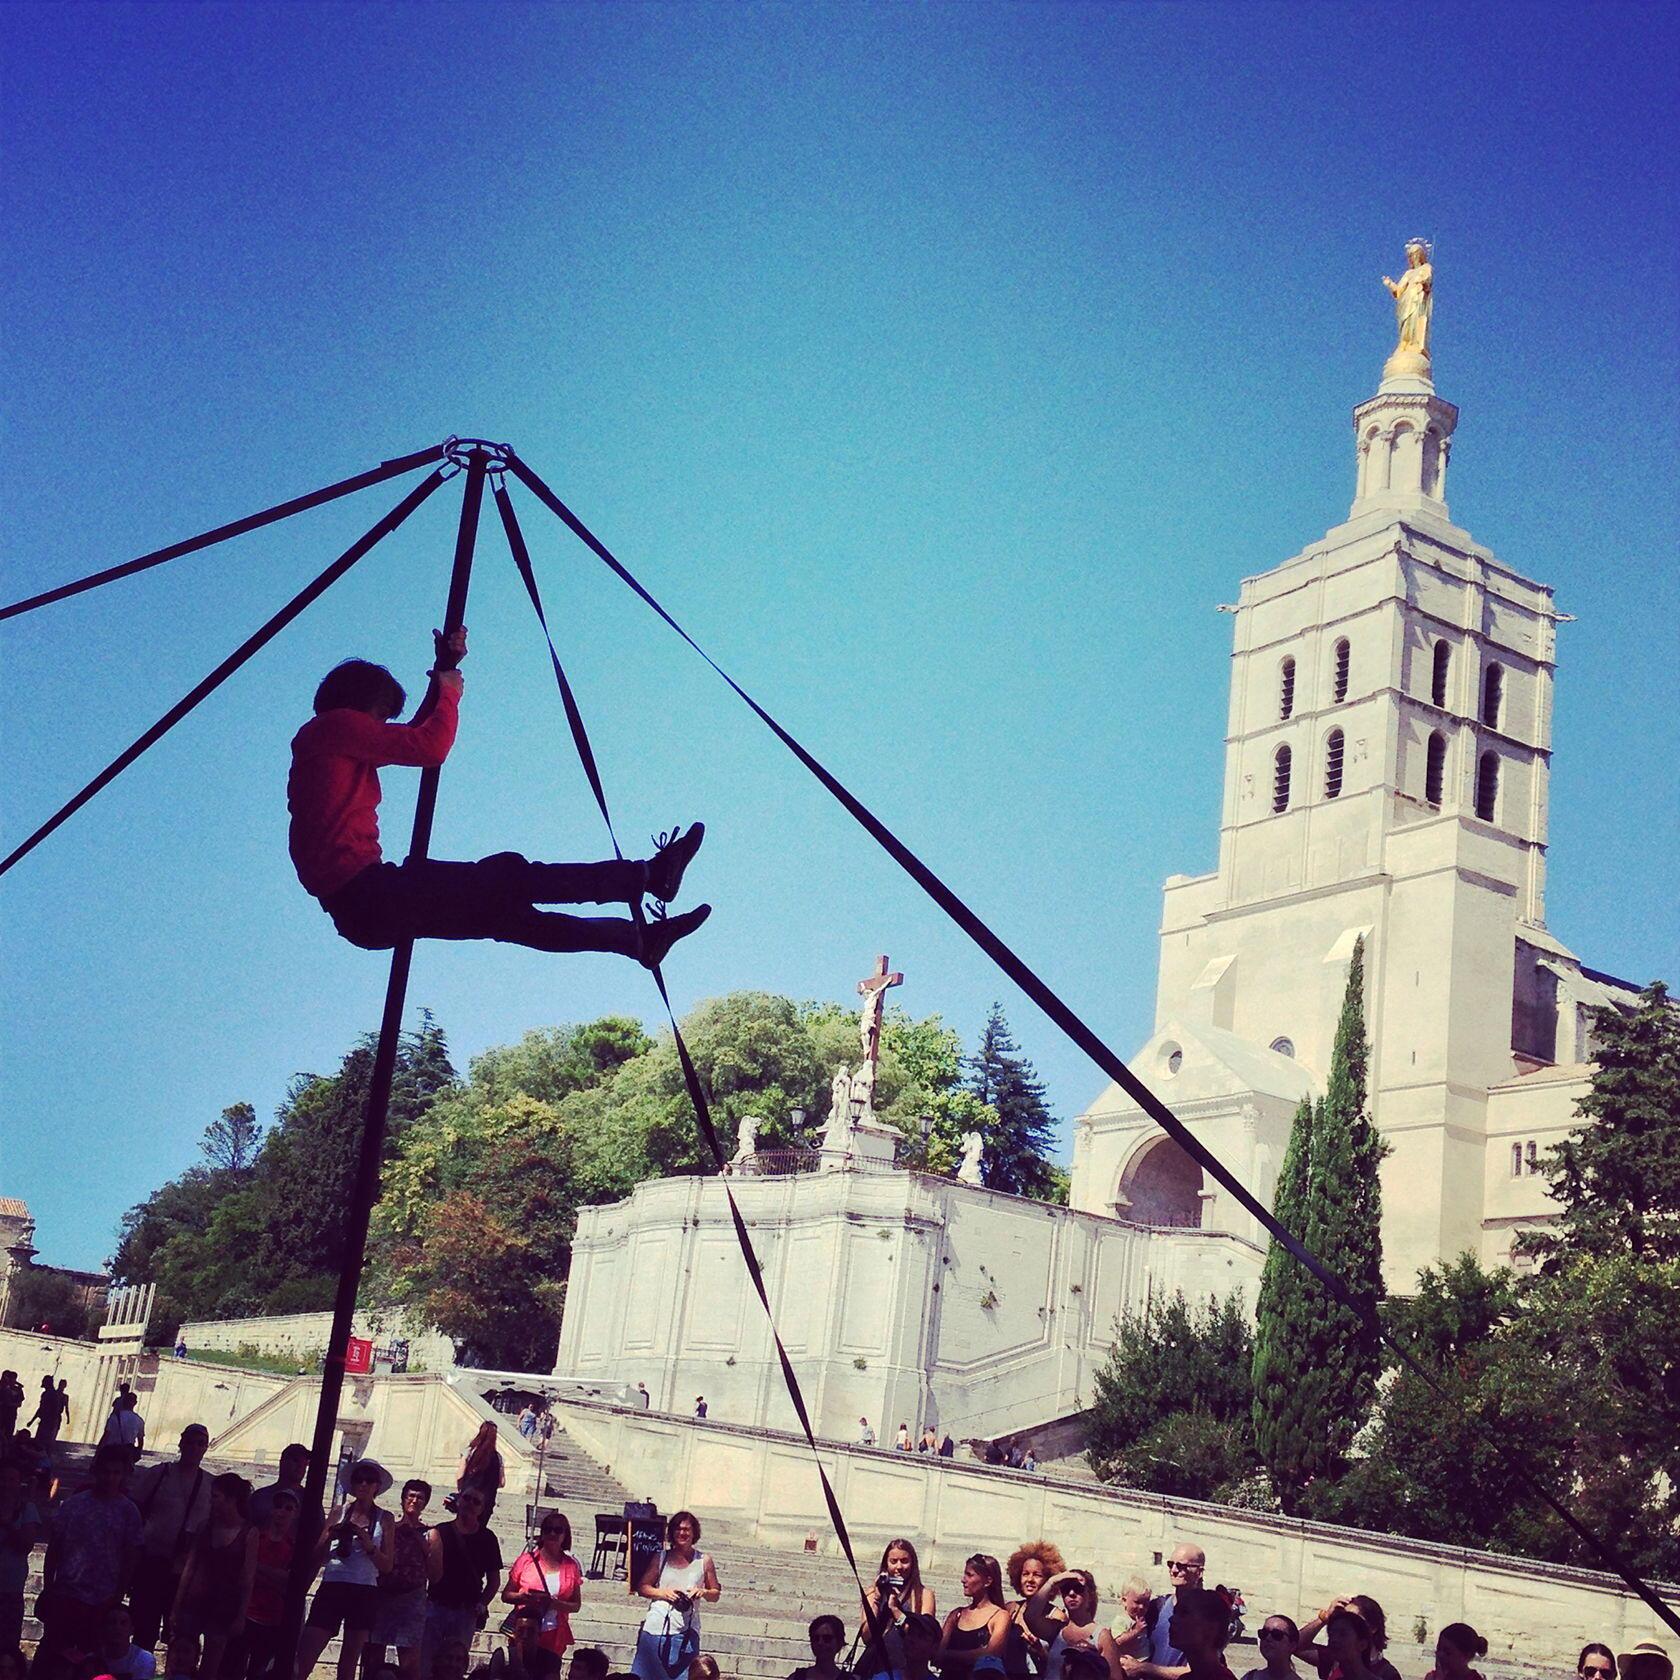 Summer Festivals Events Provence Festival d'Avignon